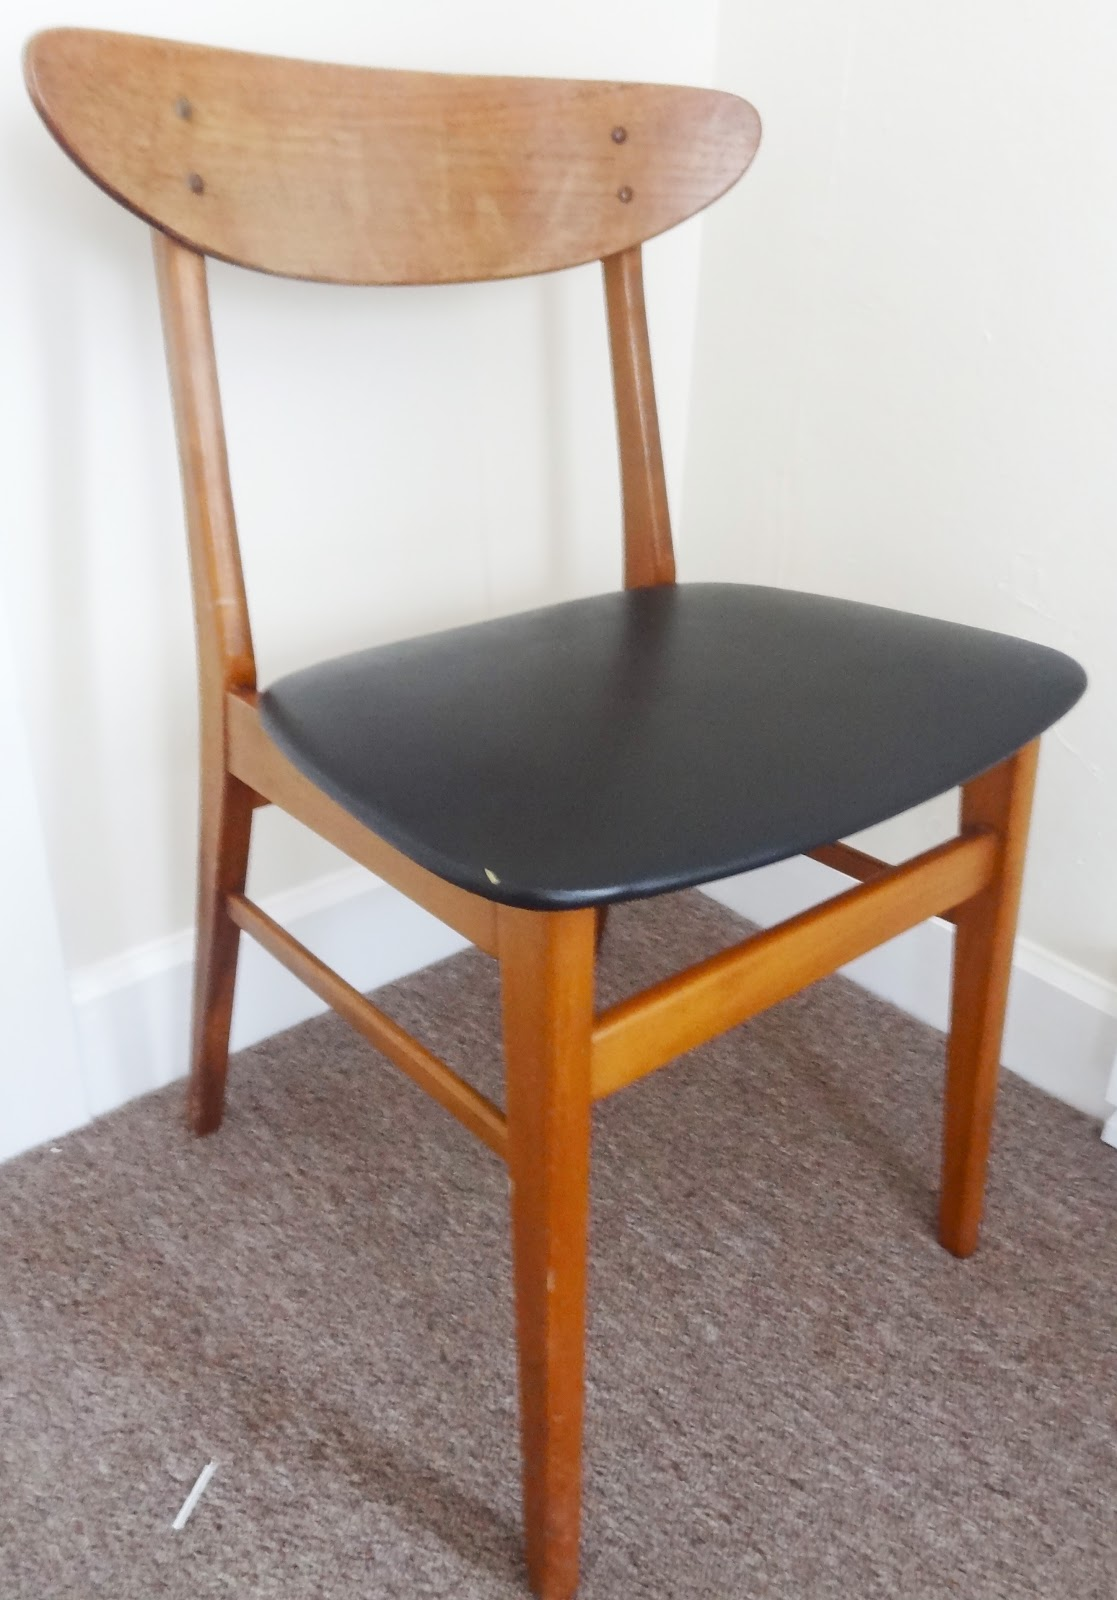 reupholstering a chair baseball rocking houzz quick fix reupholster seat revamp homegoods